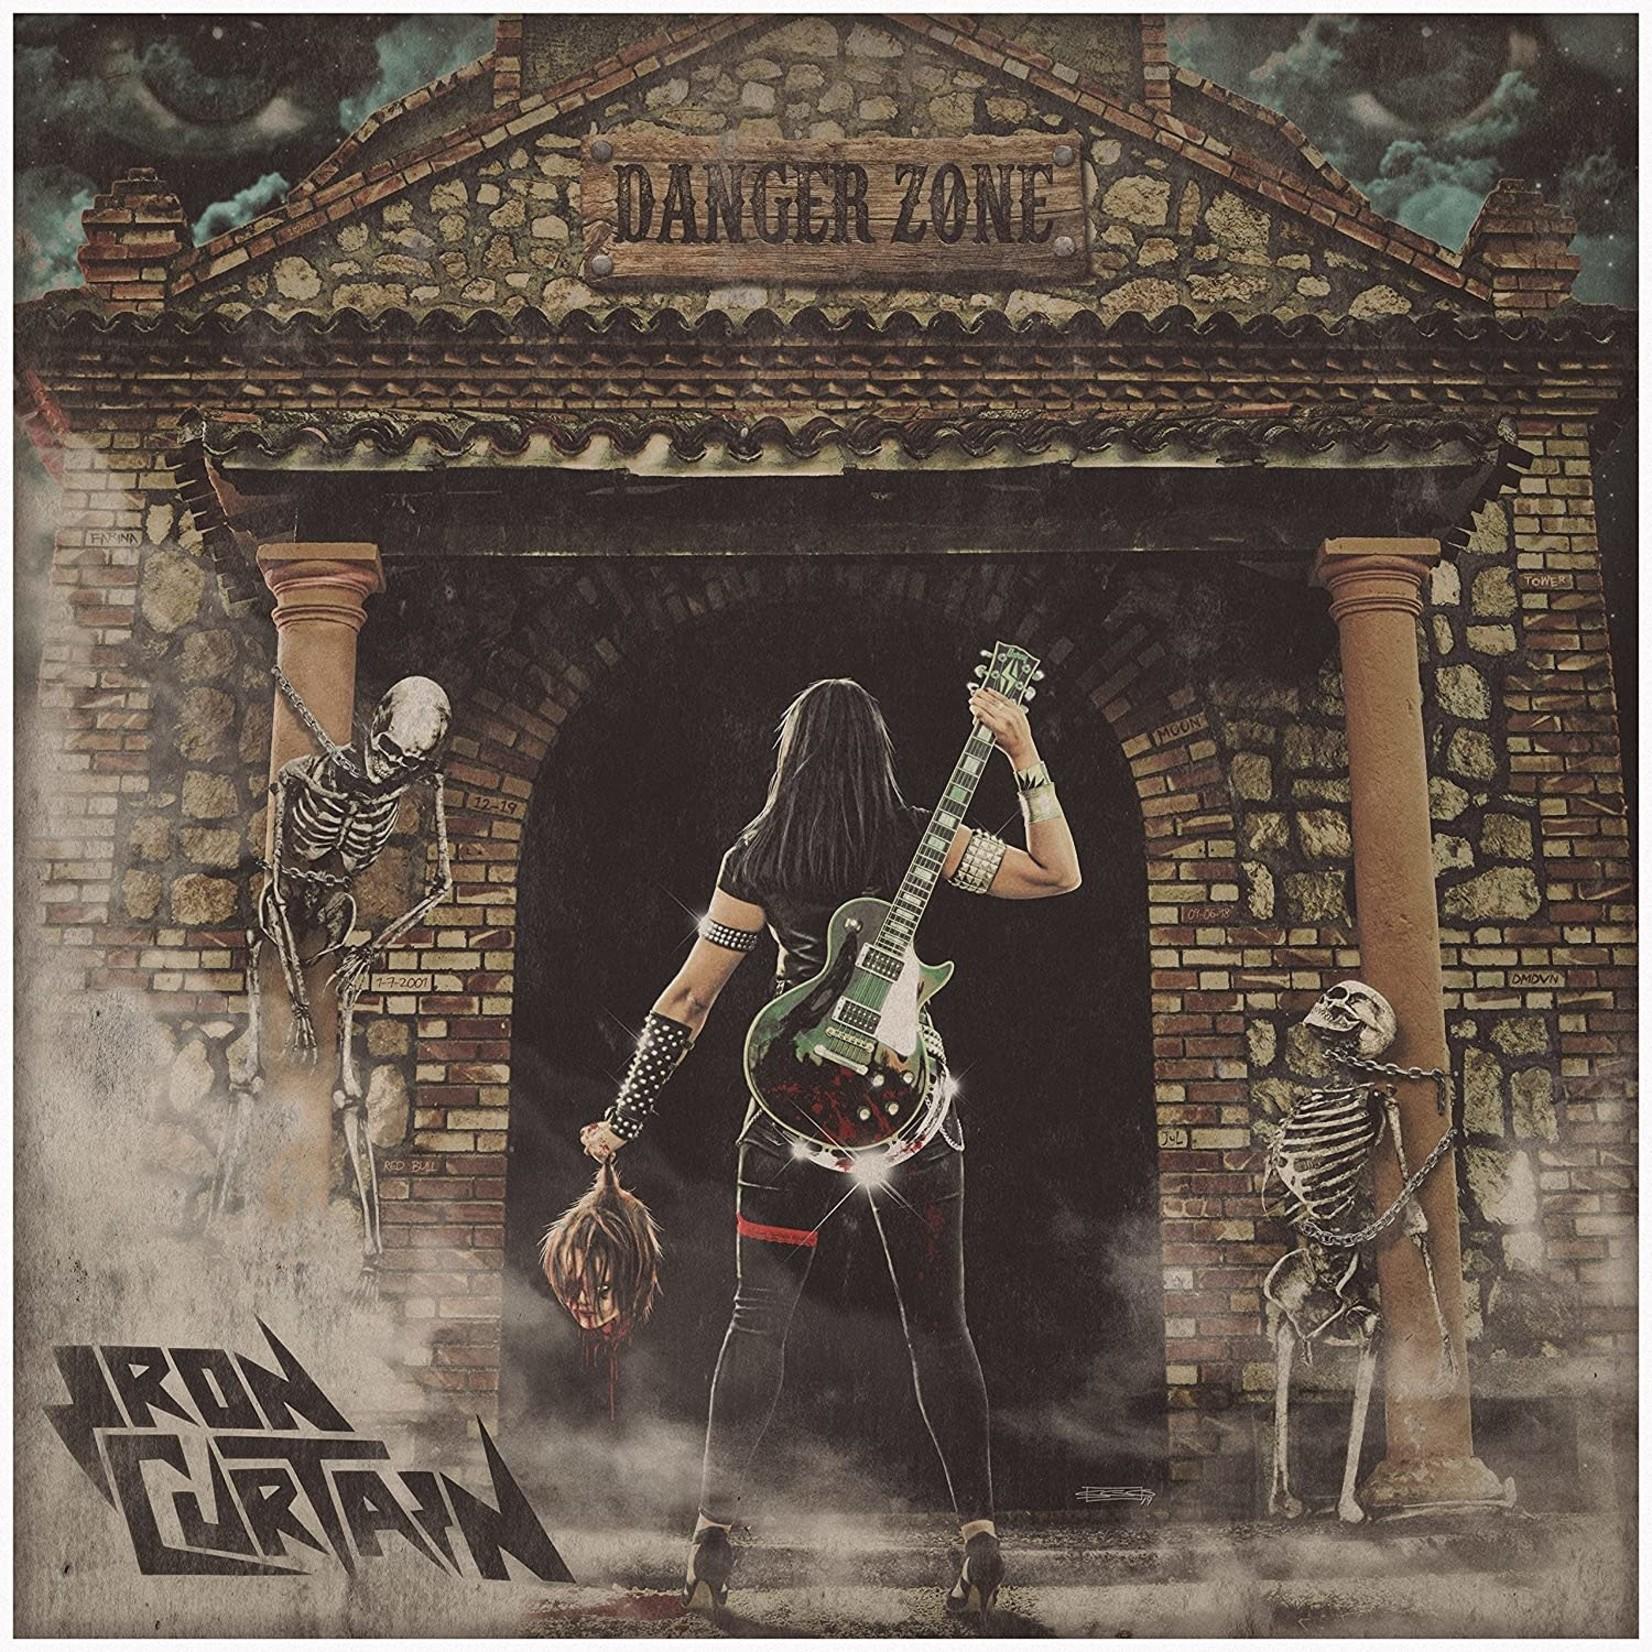 IRON CURTAIN DANGER ZONE LP